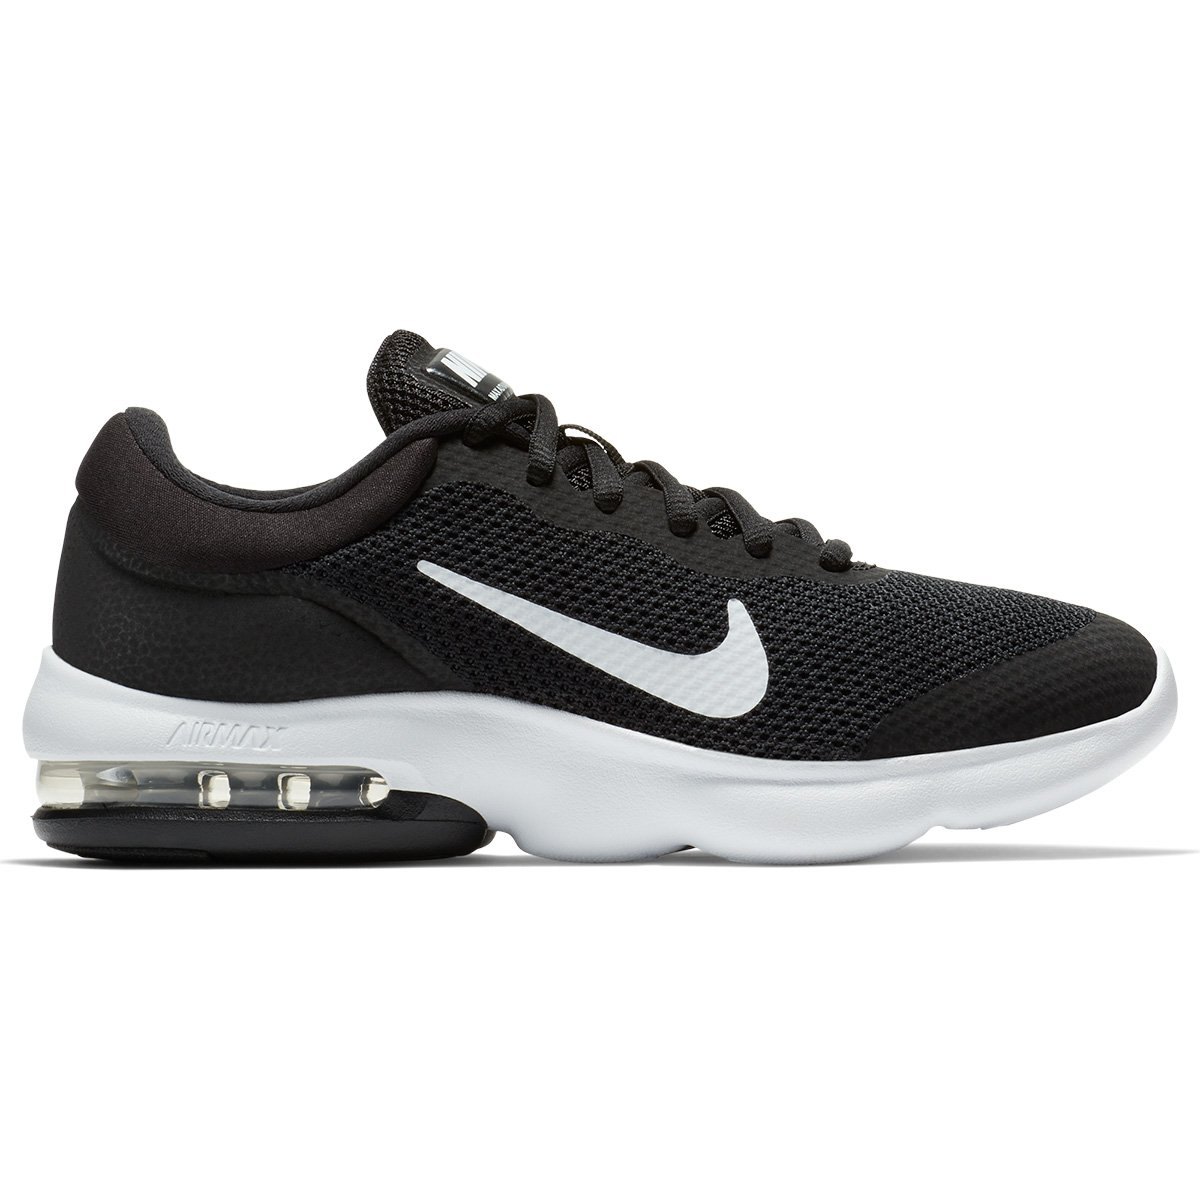 8ebf203fef4 Tênis Nike Air Max Advantage Feminino - Preto e Branco - Compre Agora